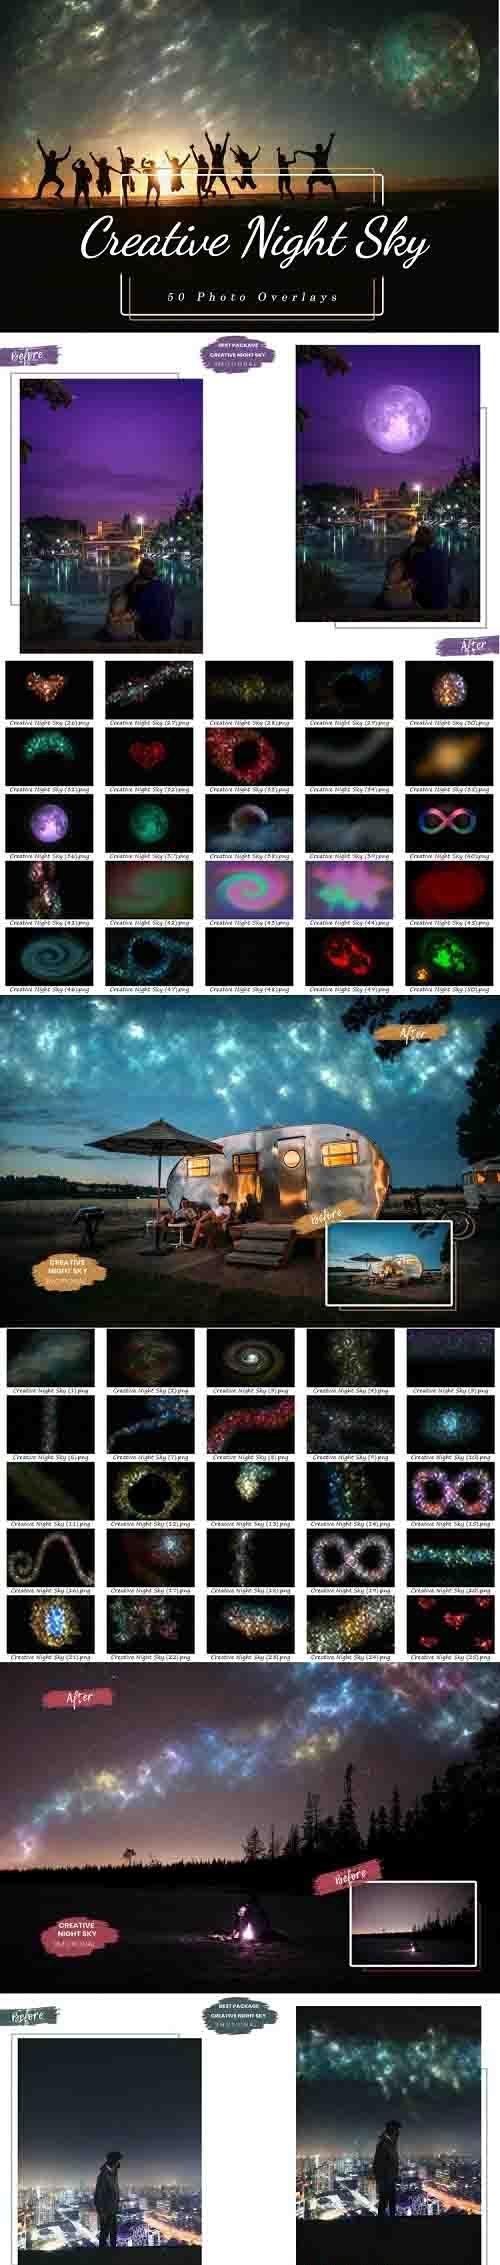 50 Creative Night Sky, Add Starry Sky To Photo, Moon Overlay - 1239110